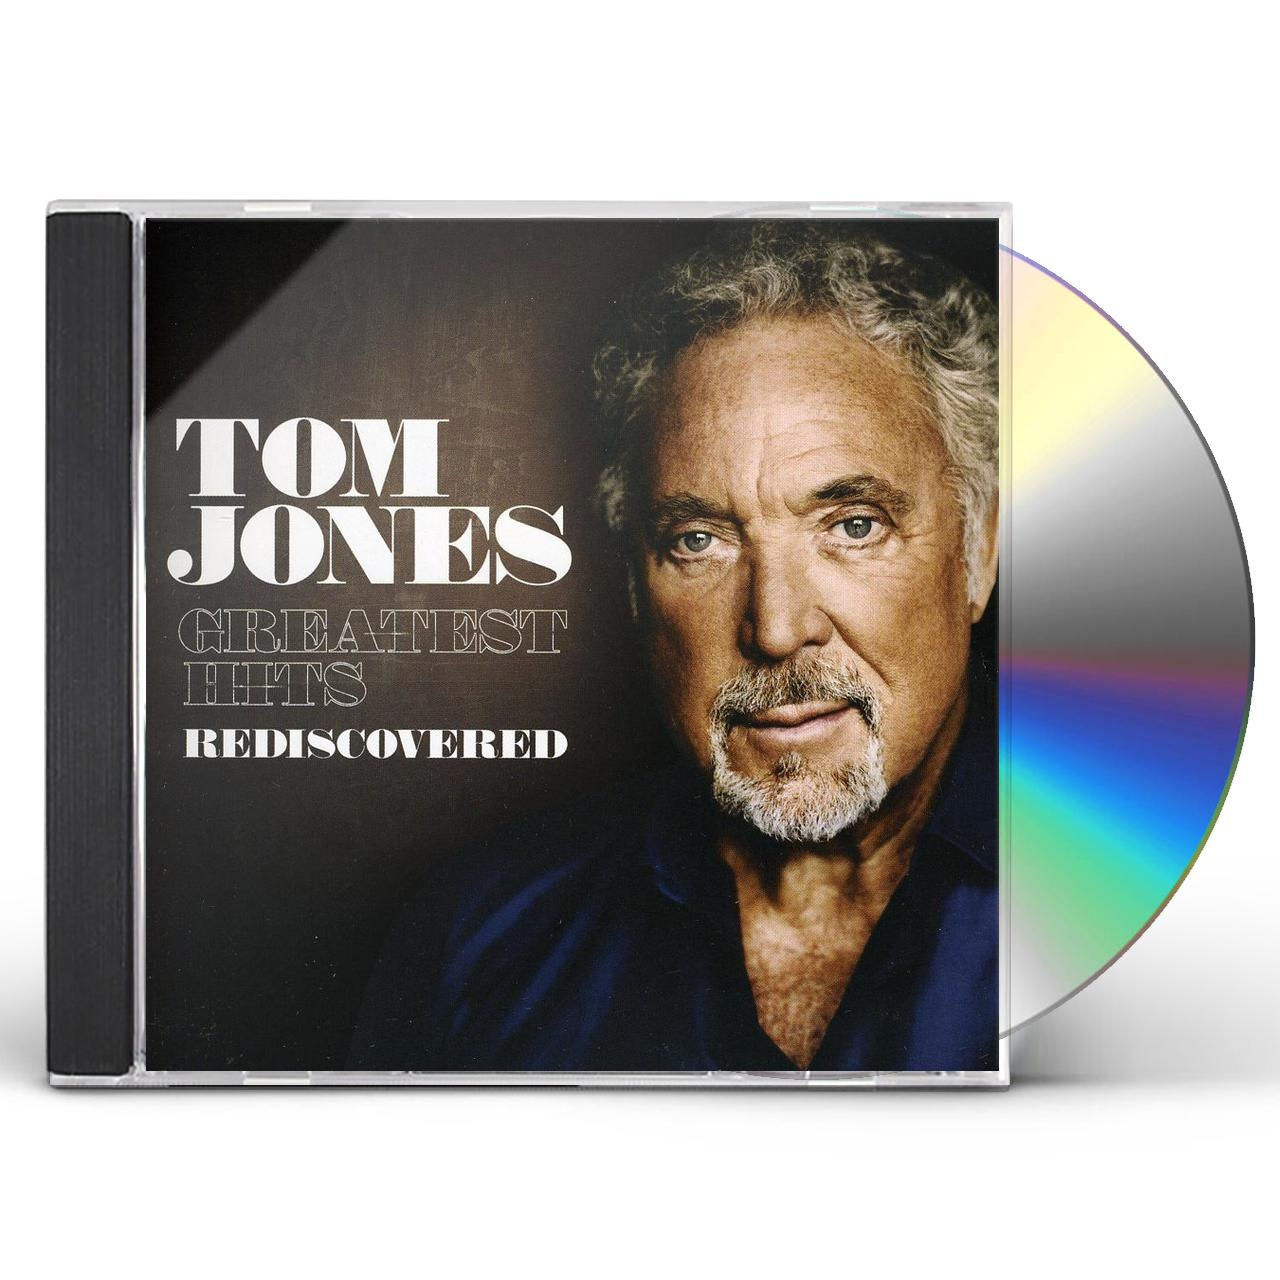 Tom Jones - CD Greatest Hits: Rediscovered